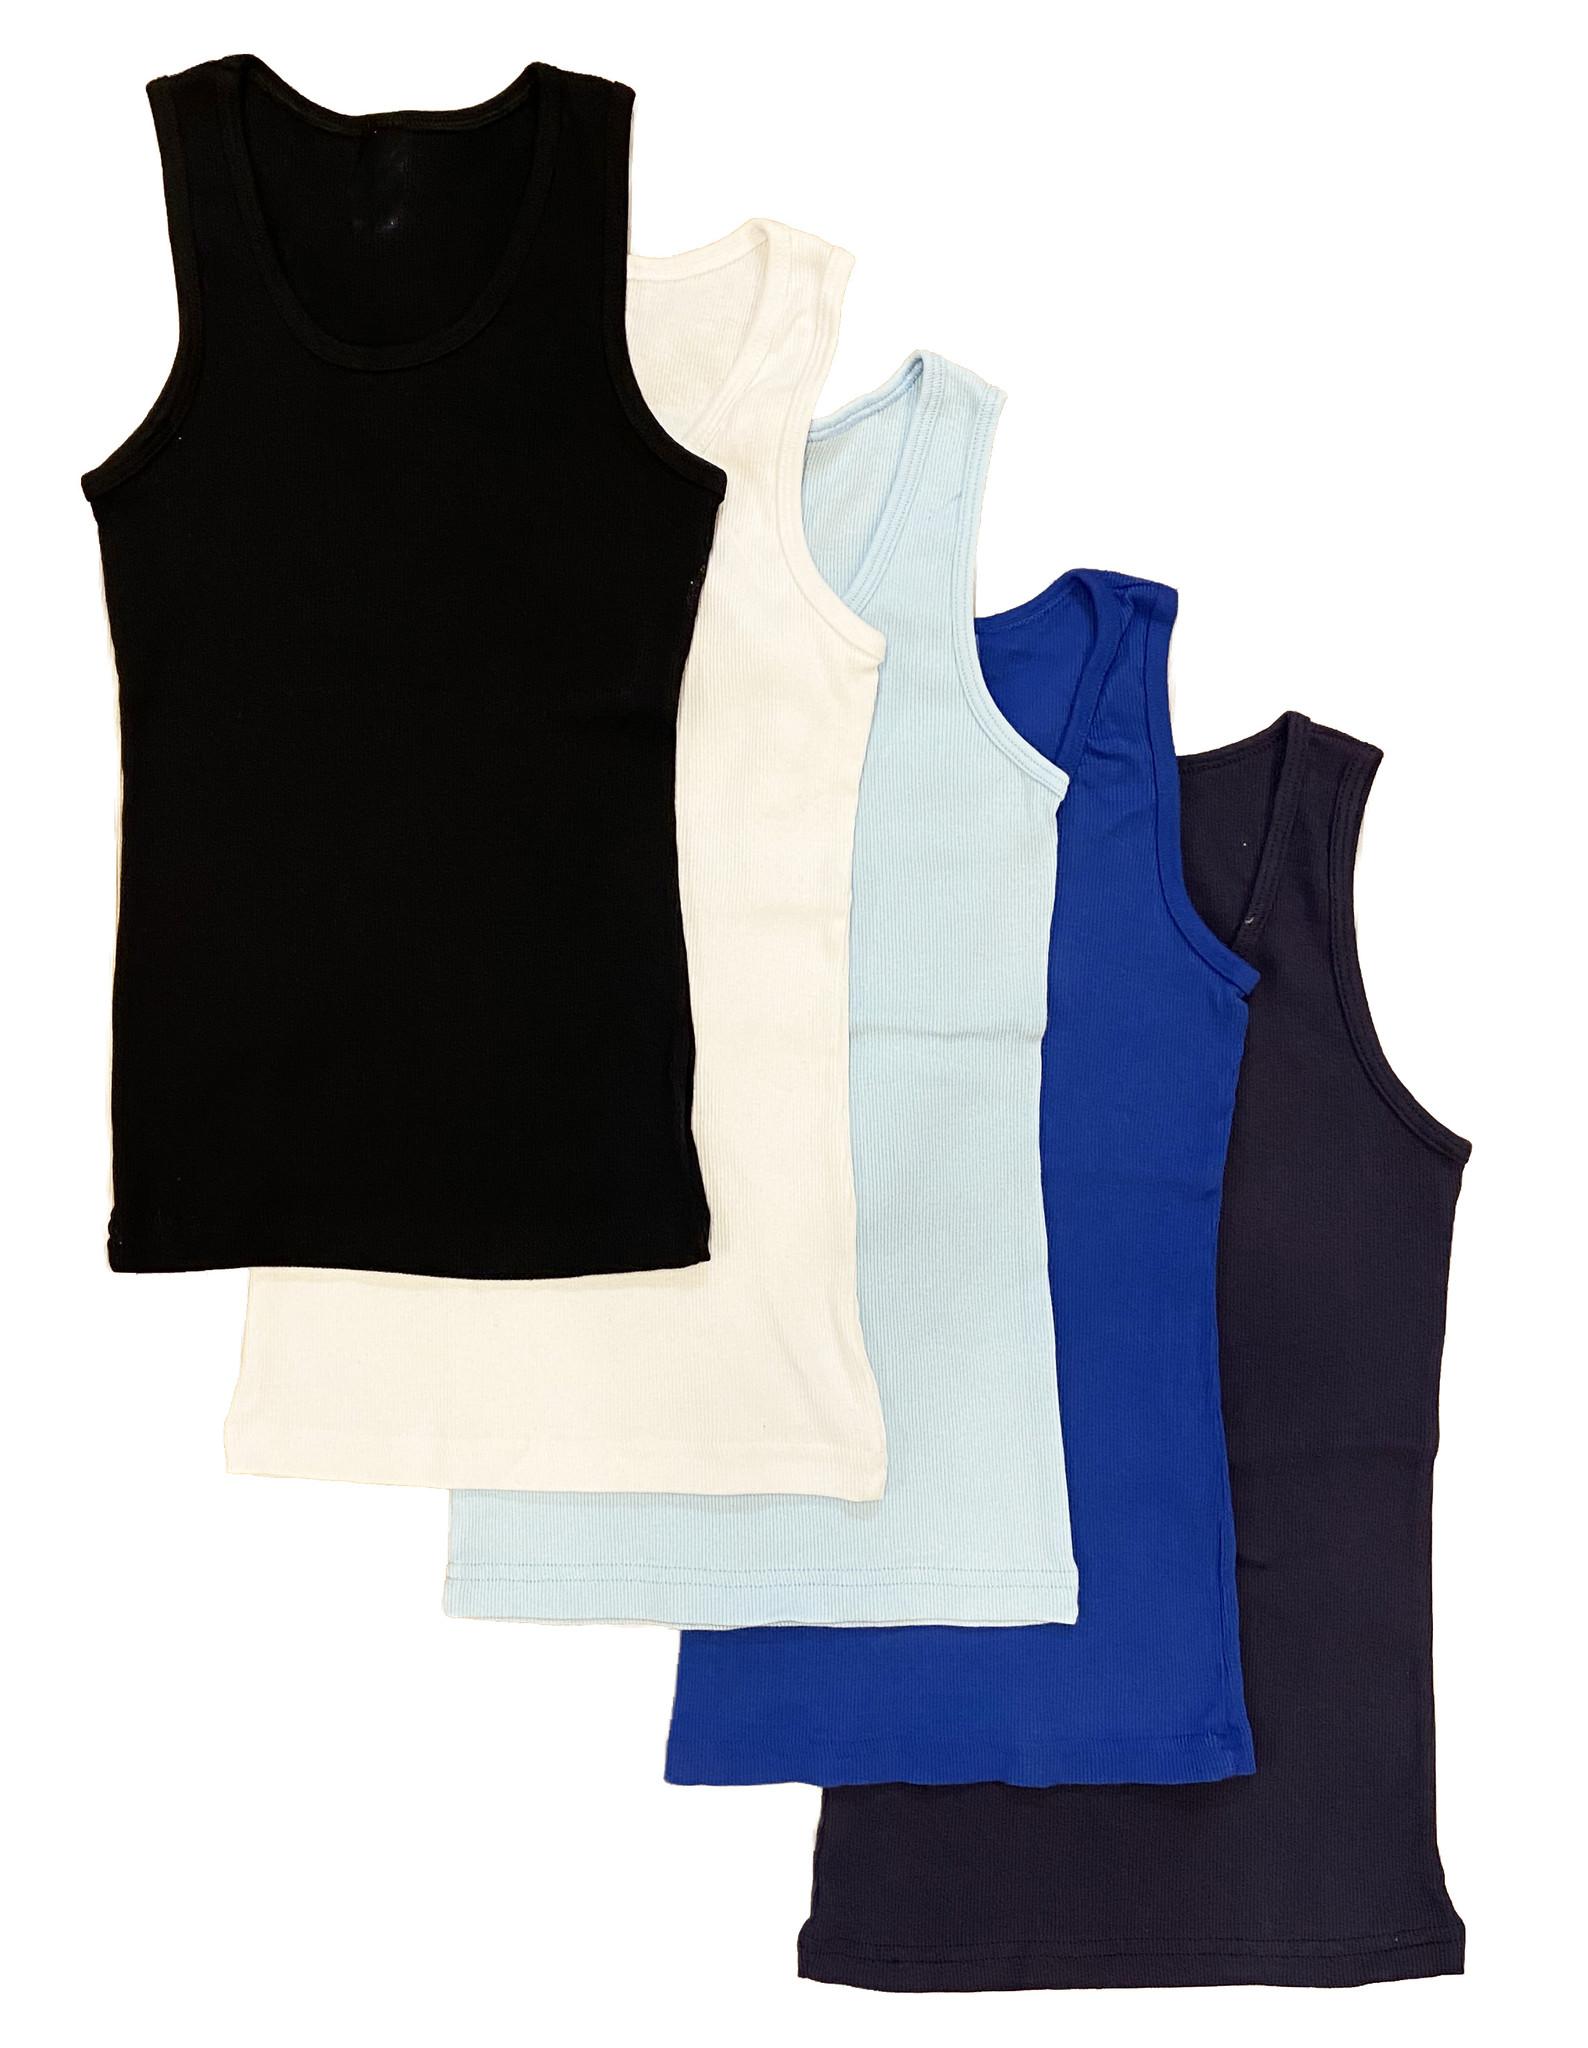 Favorite Ribbed Tank Top - Basics - 5 colors